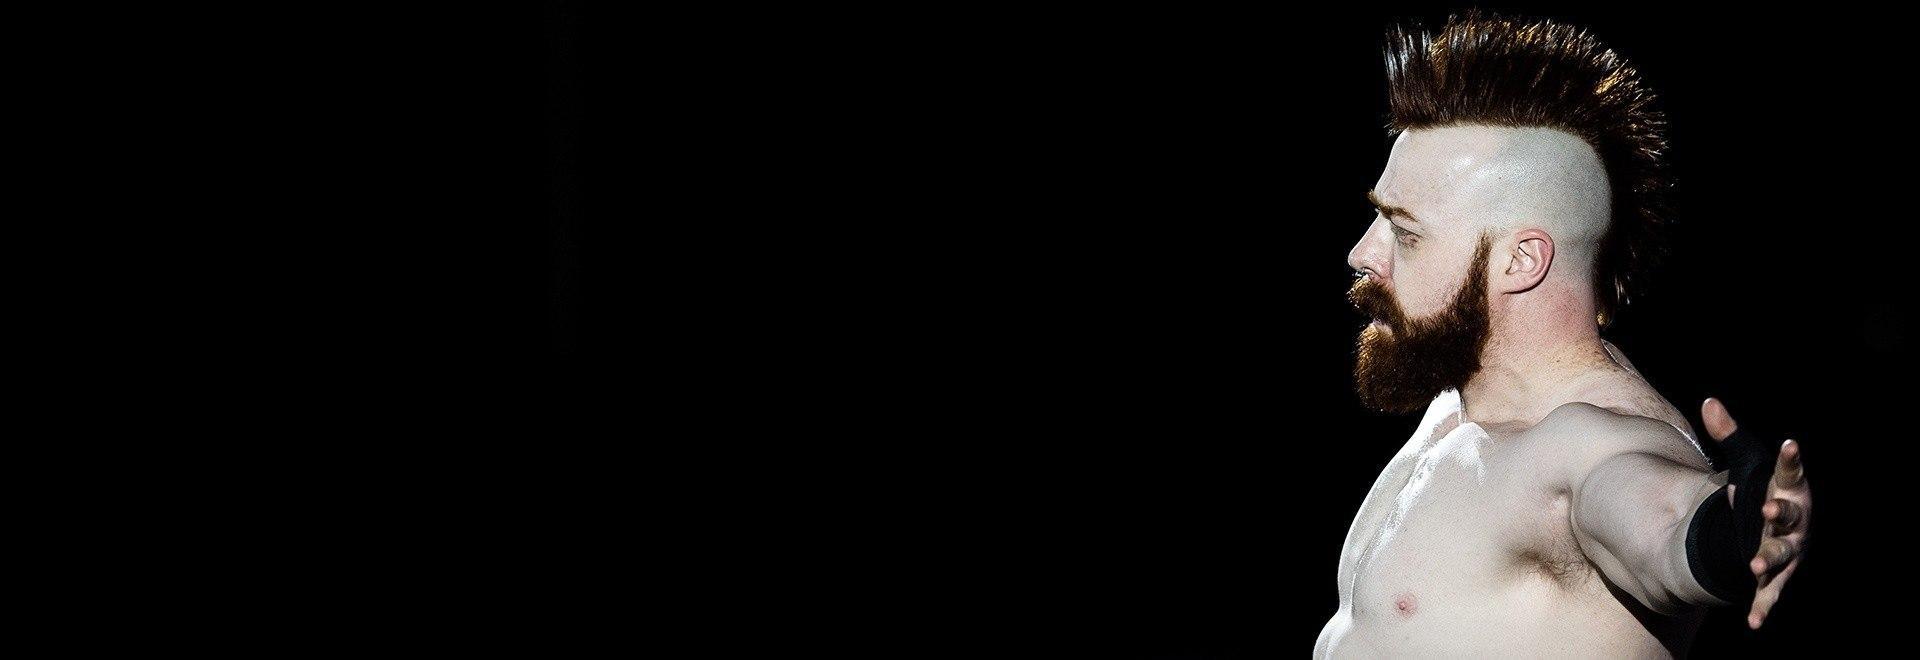 Ep. 253